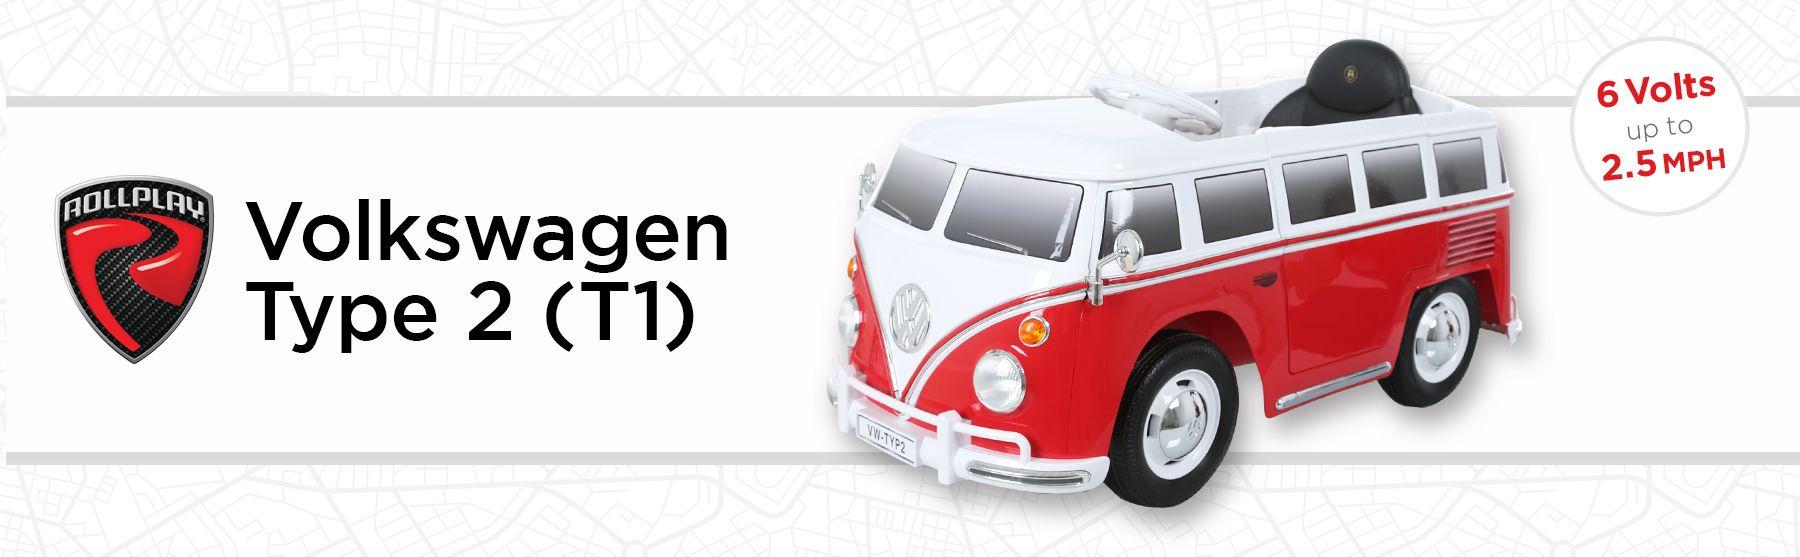 Rollplay VW Bus 6 Volt Battery Ride-On Vehicle - Walmart com